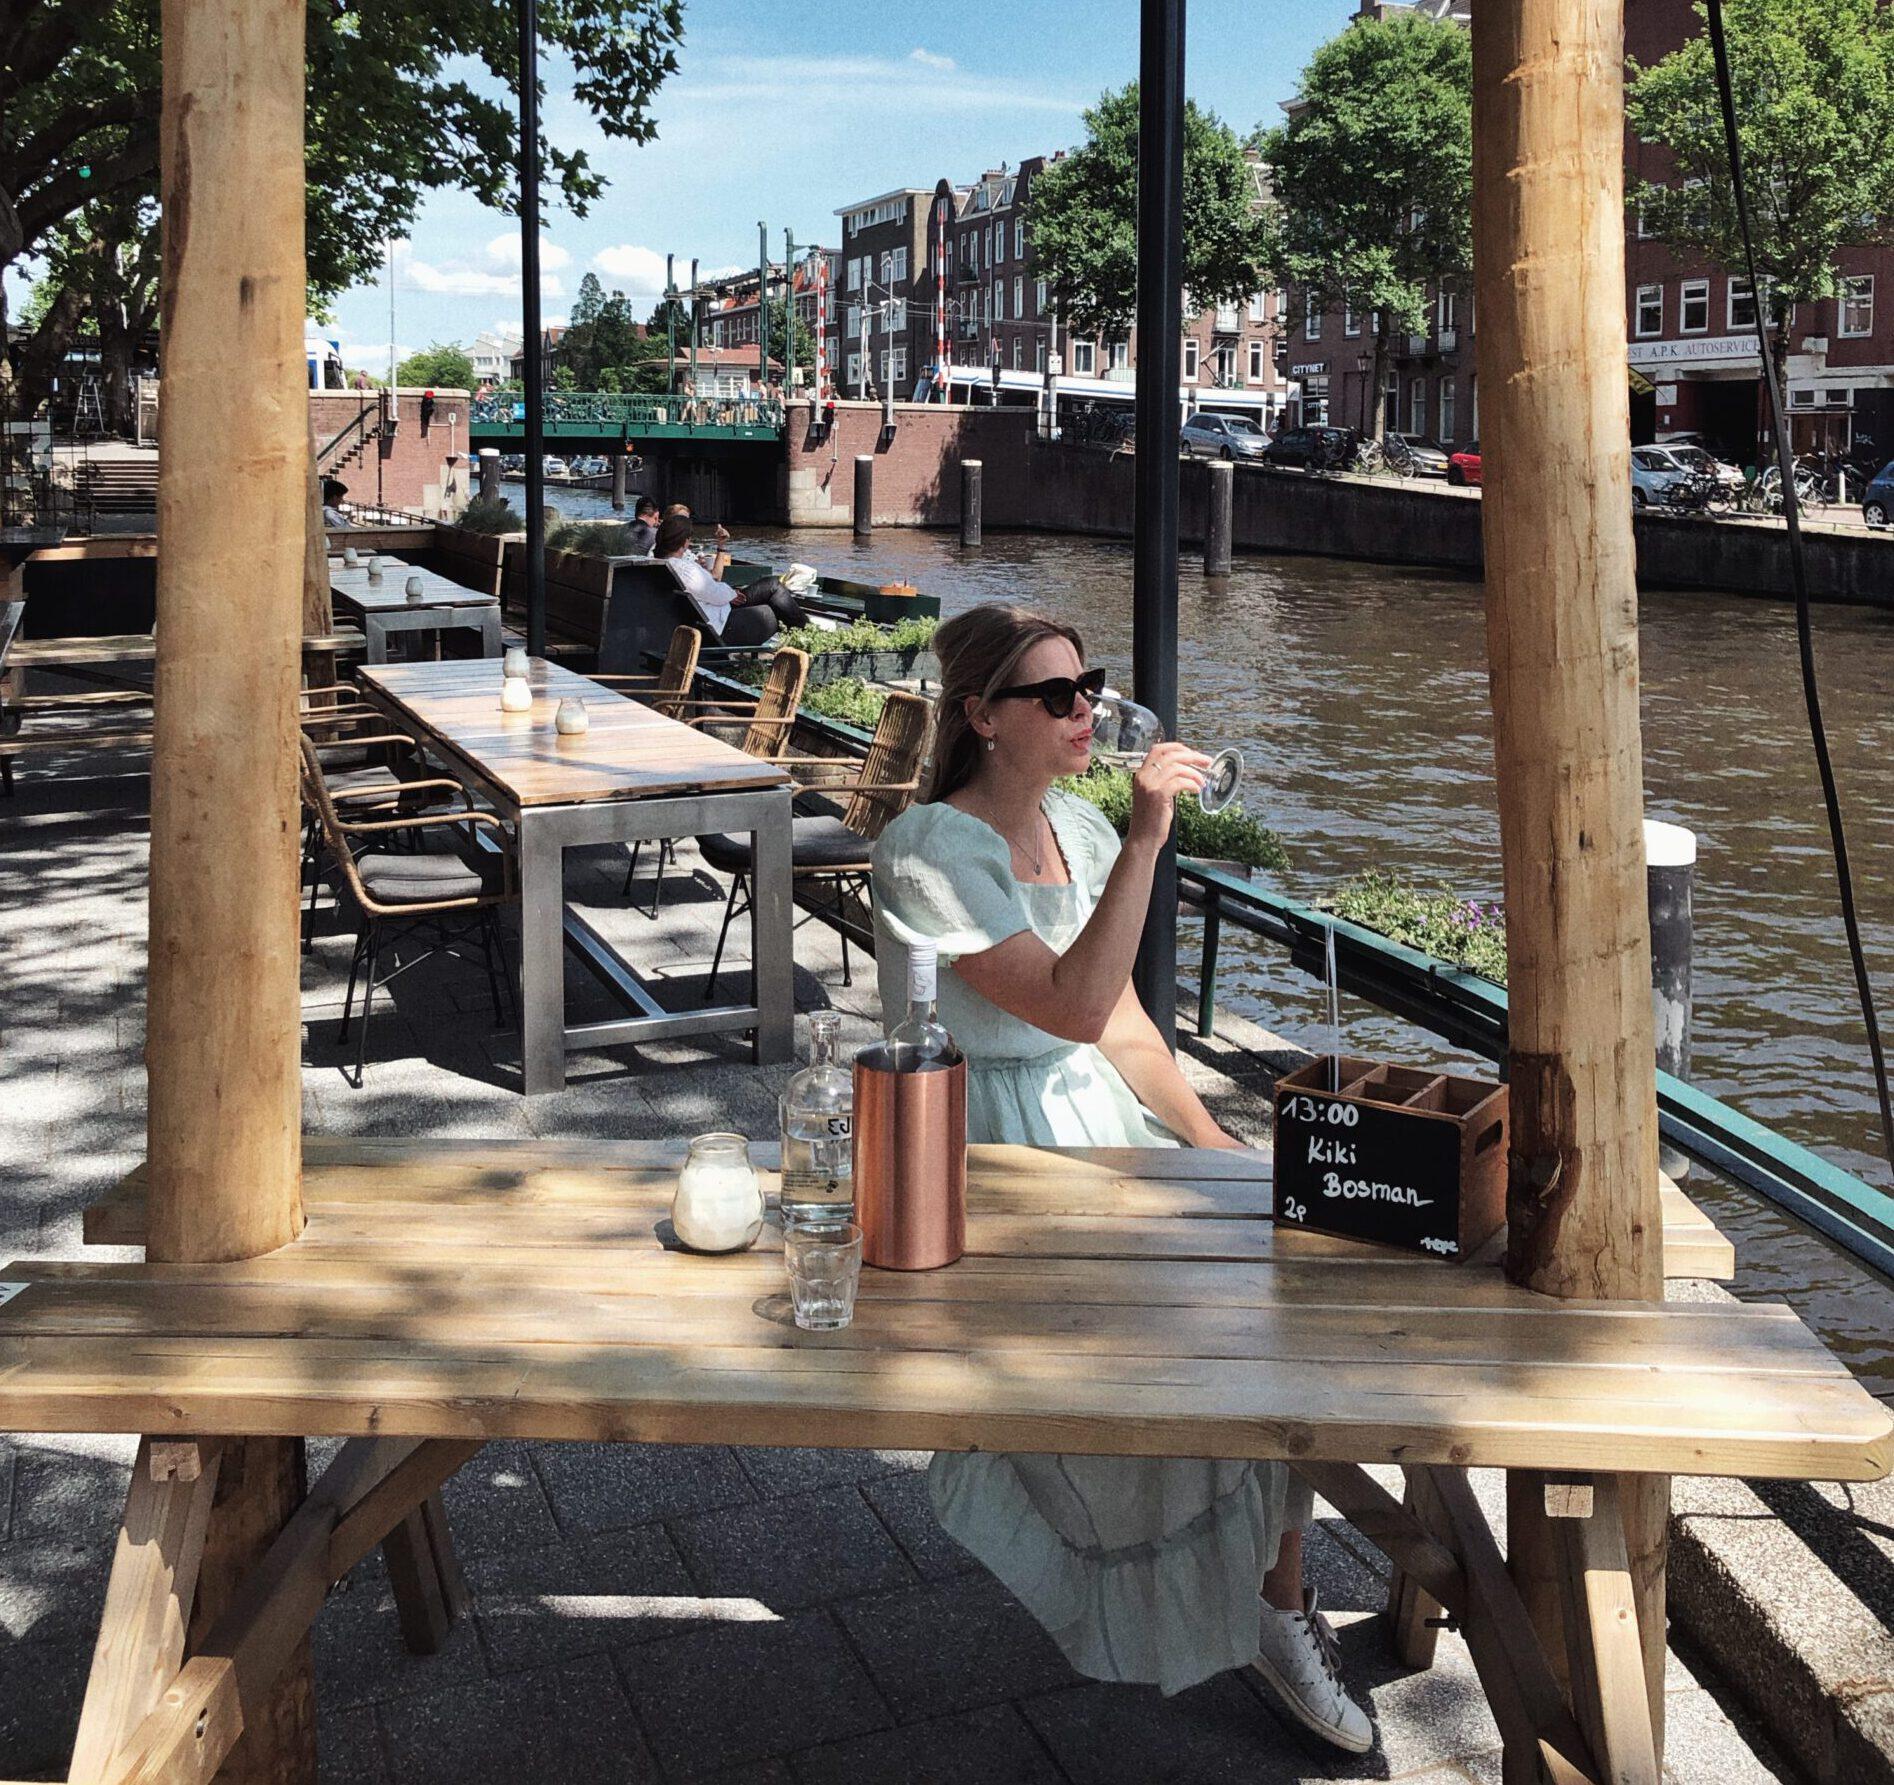 grote terrassen amsterdam - terrassen amsterdam - borrelen amsterdam - terras amsterdam - lunch - diner - borrel - hotspots amsterdam